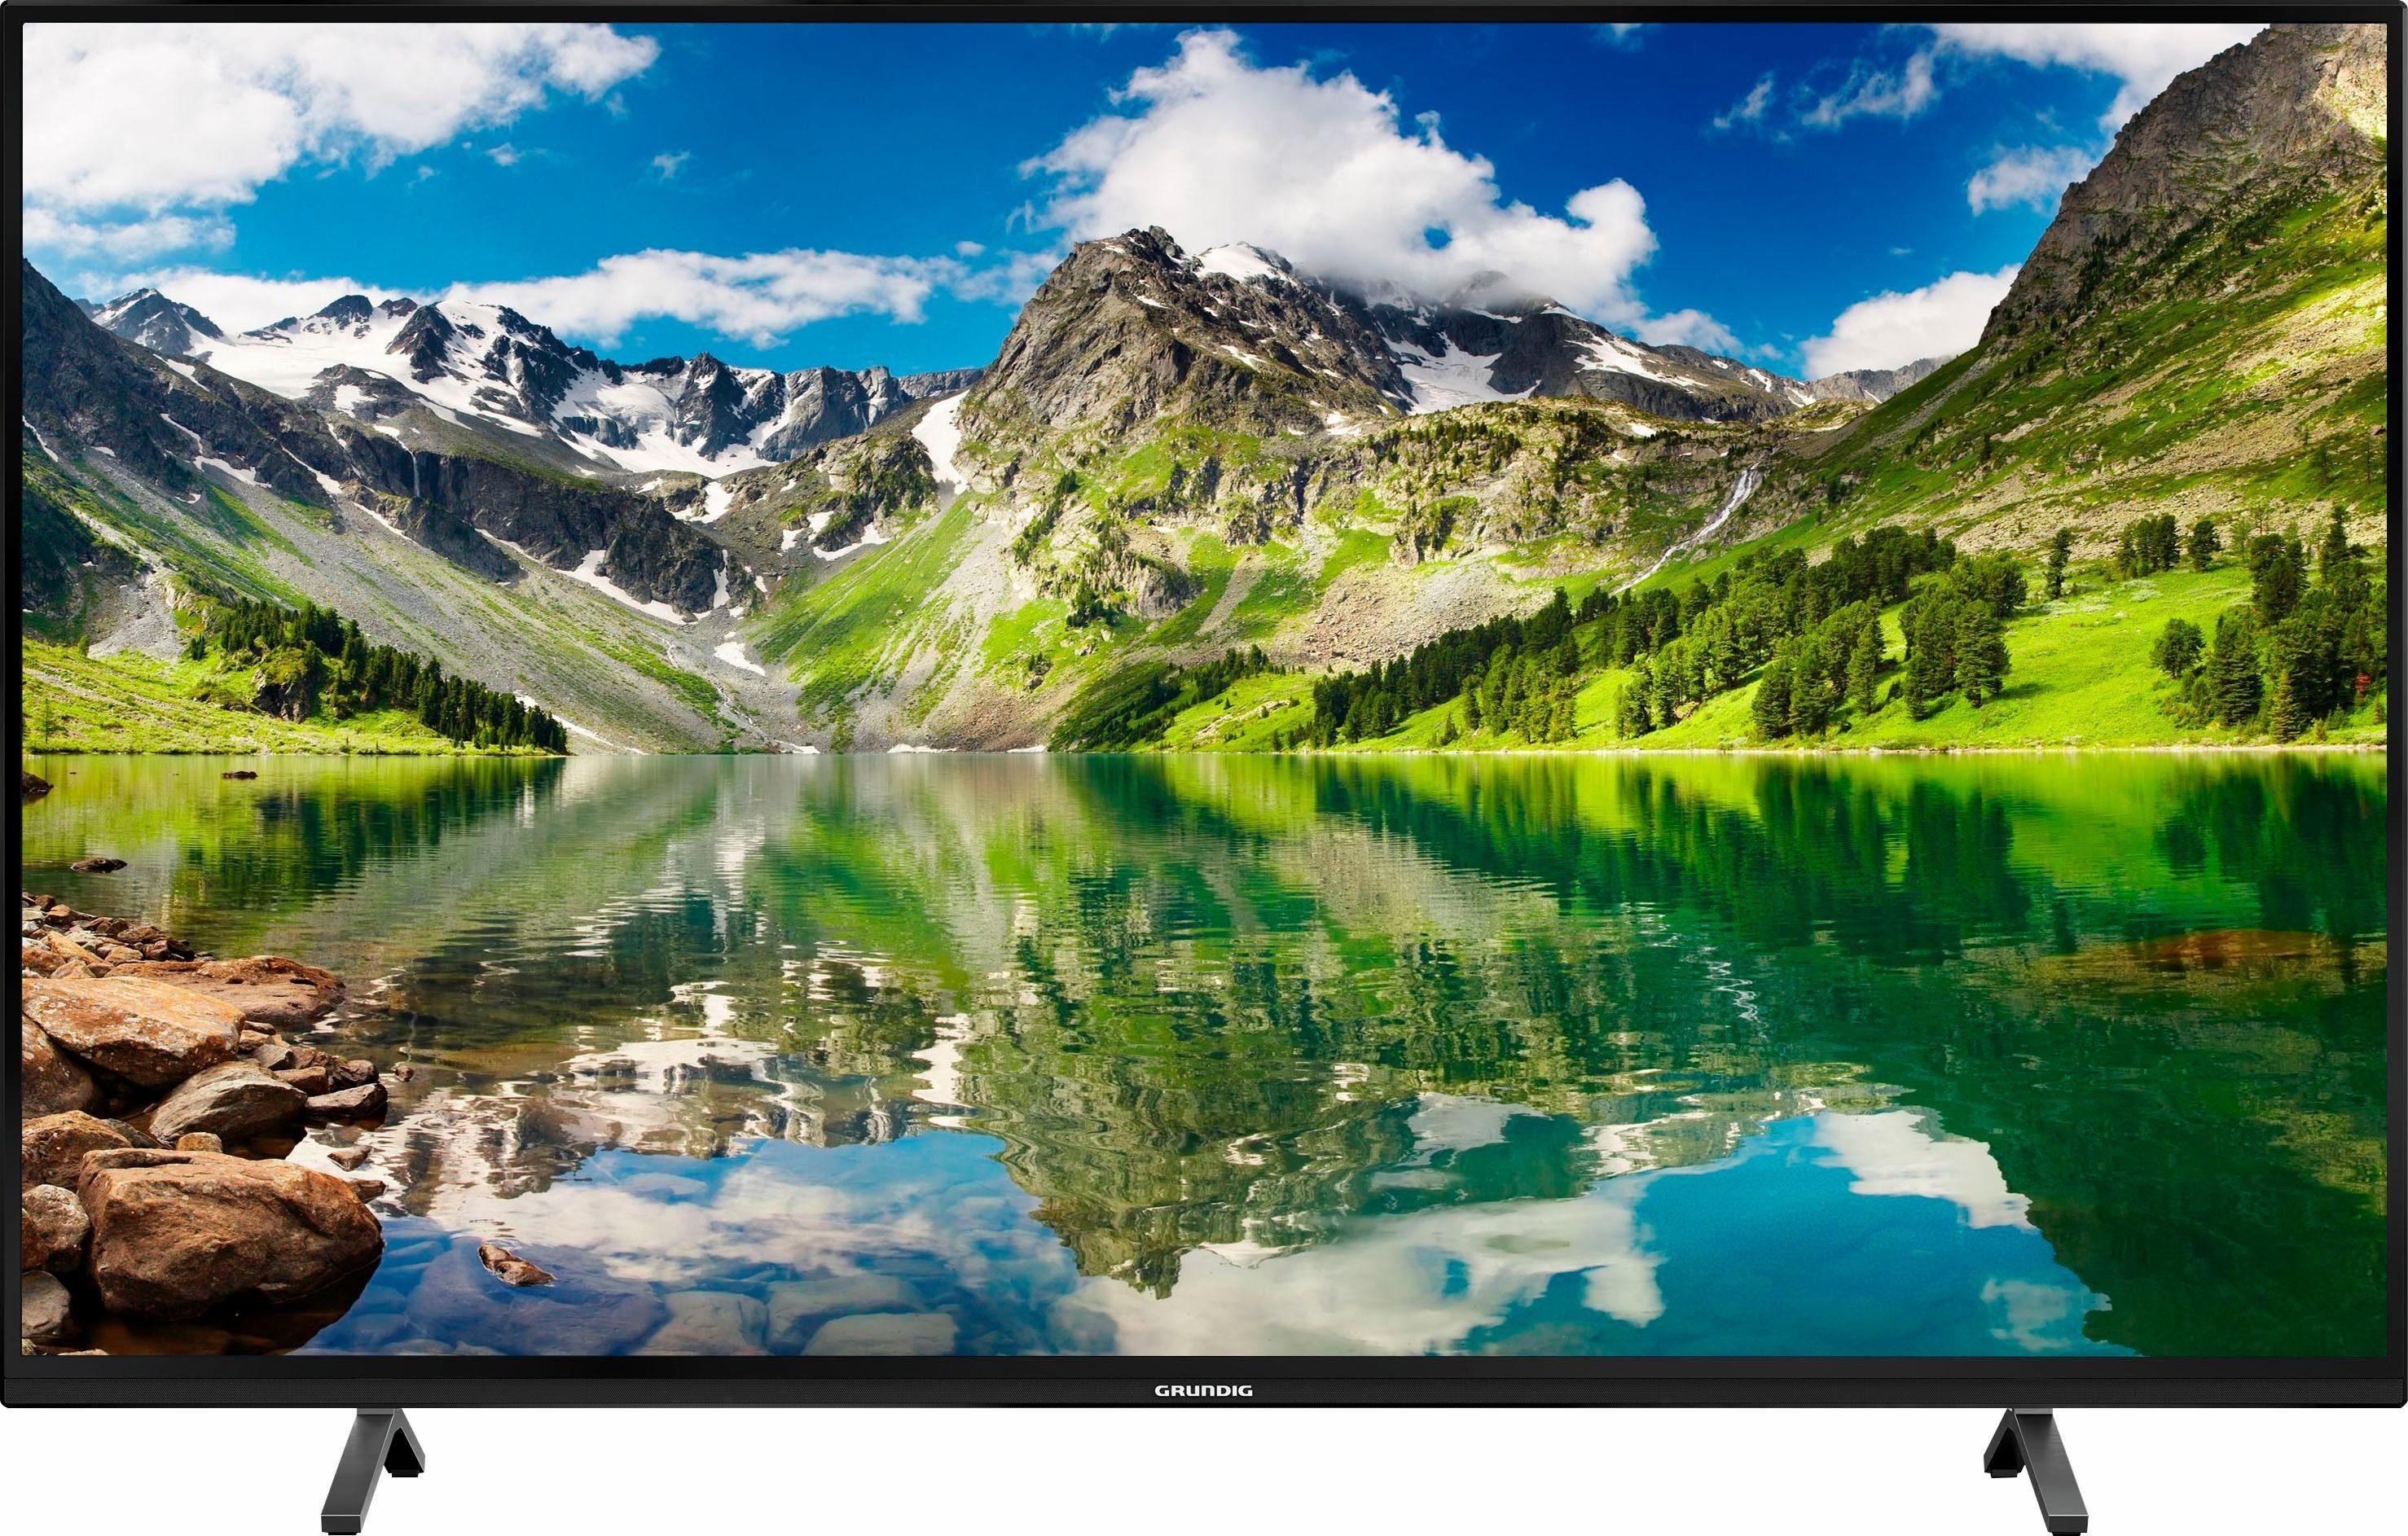 Grundig 65 VLX 7000 BP LED-Fernseher (164 cm/65 Zoll, 4K Ultra HD, Smart-TV)